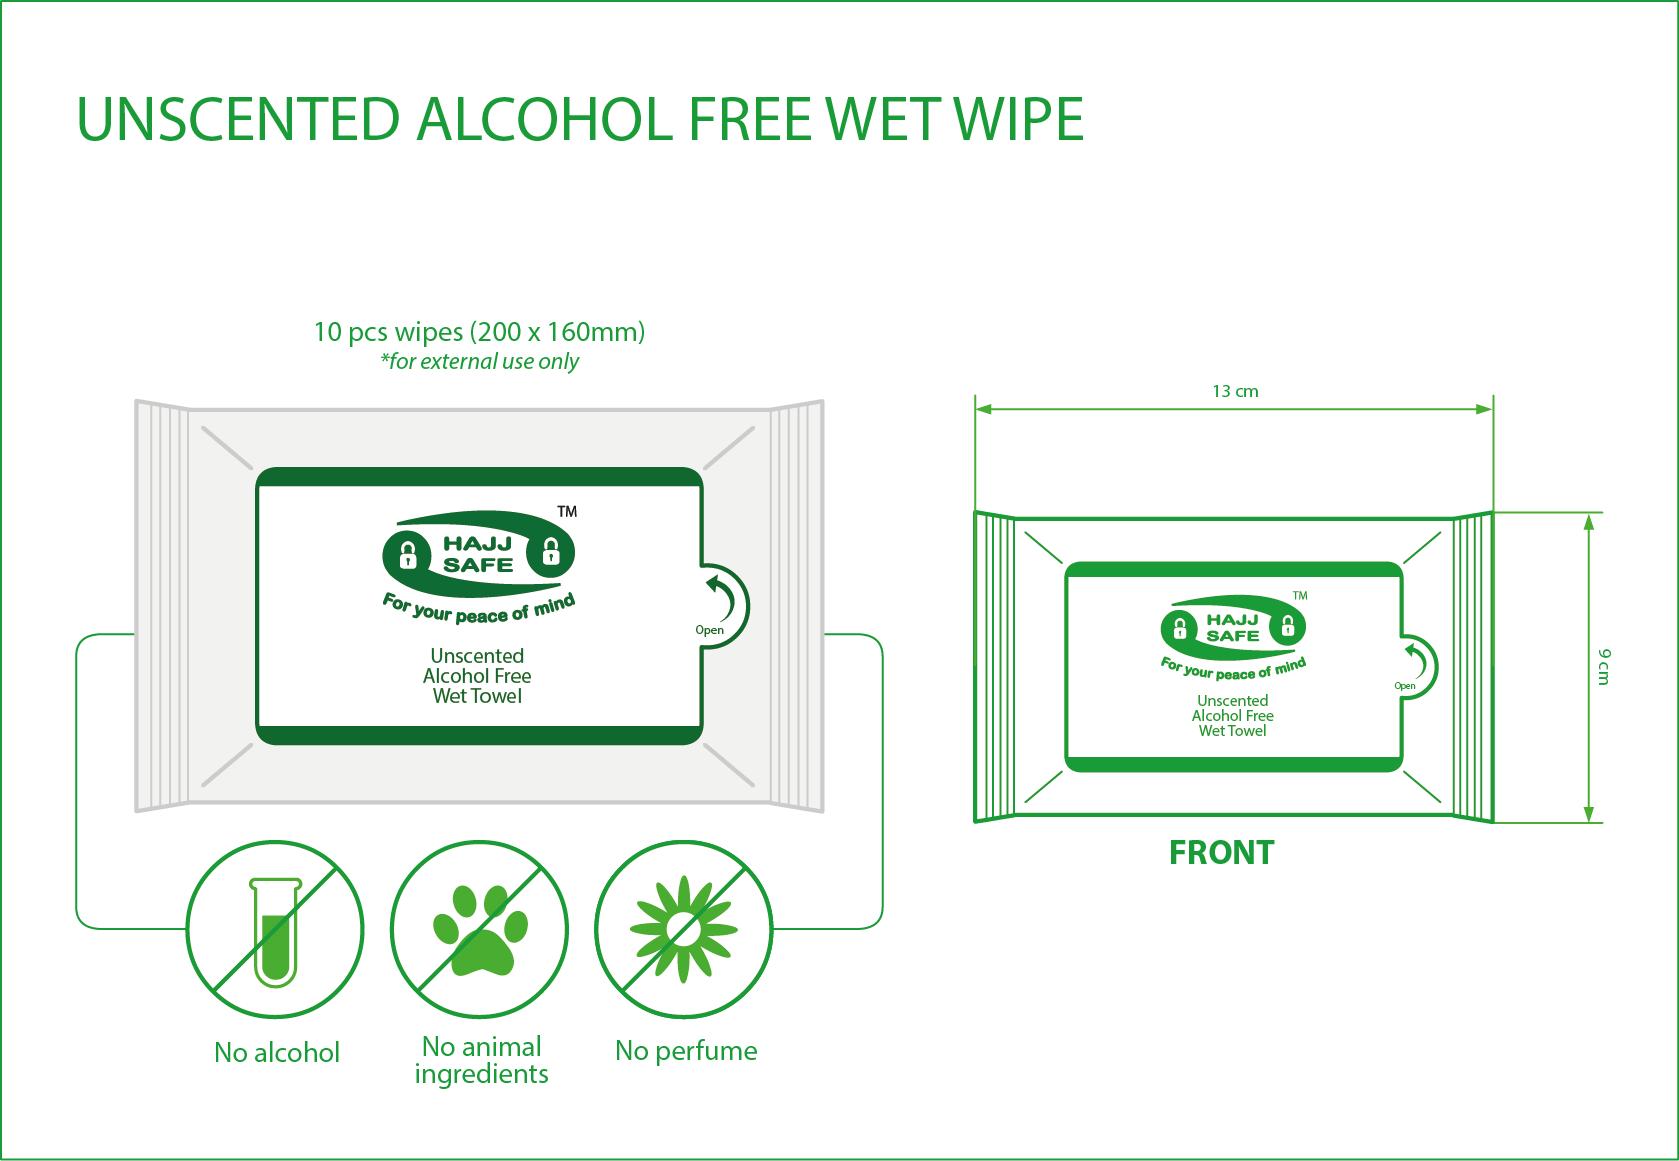 hajj-umrah-unscented-wet-wipe.png